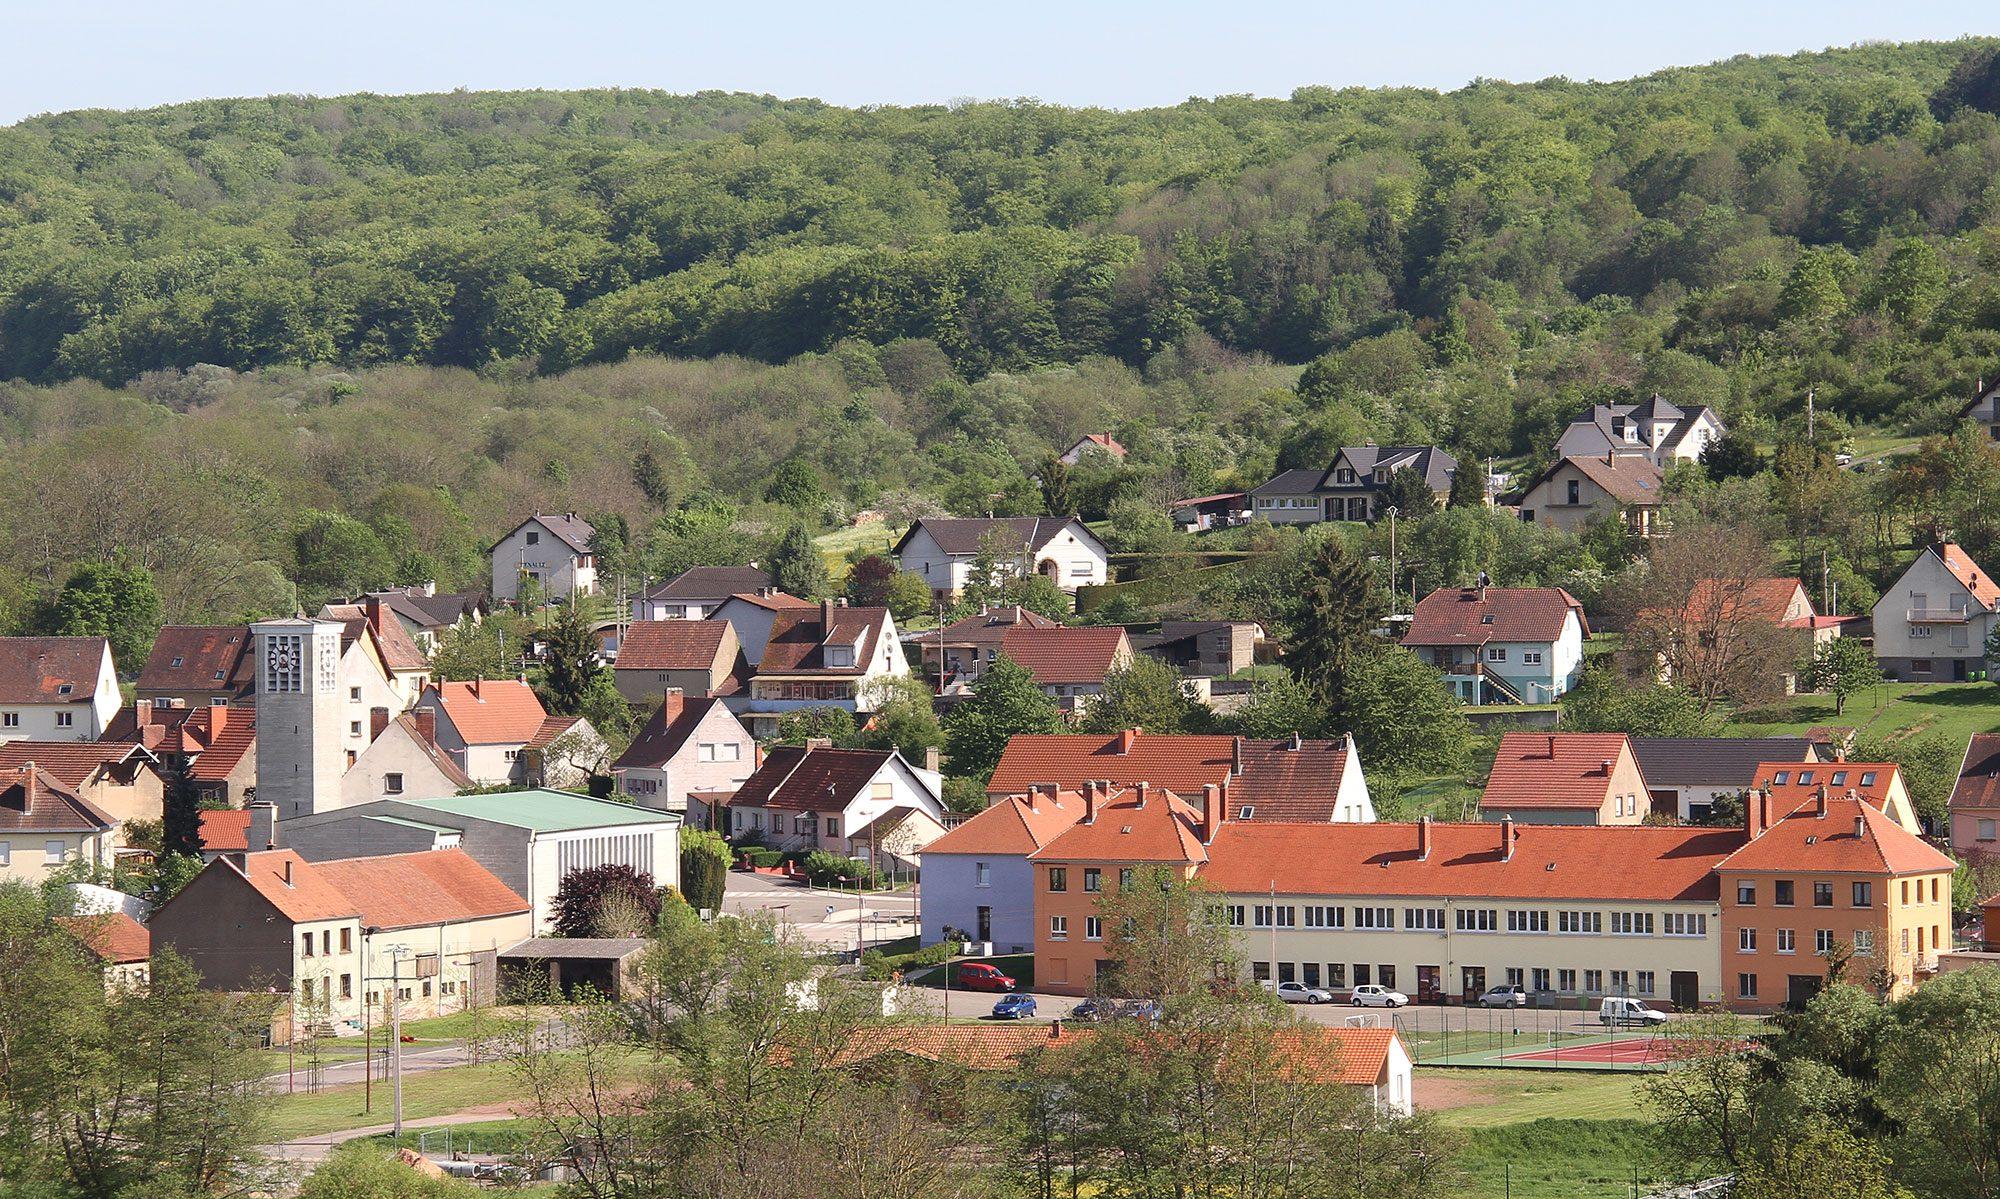 La commune de Bliesbruck